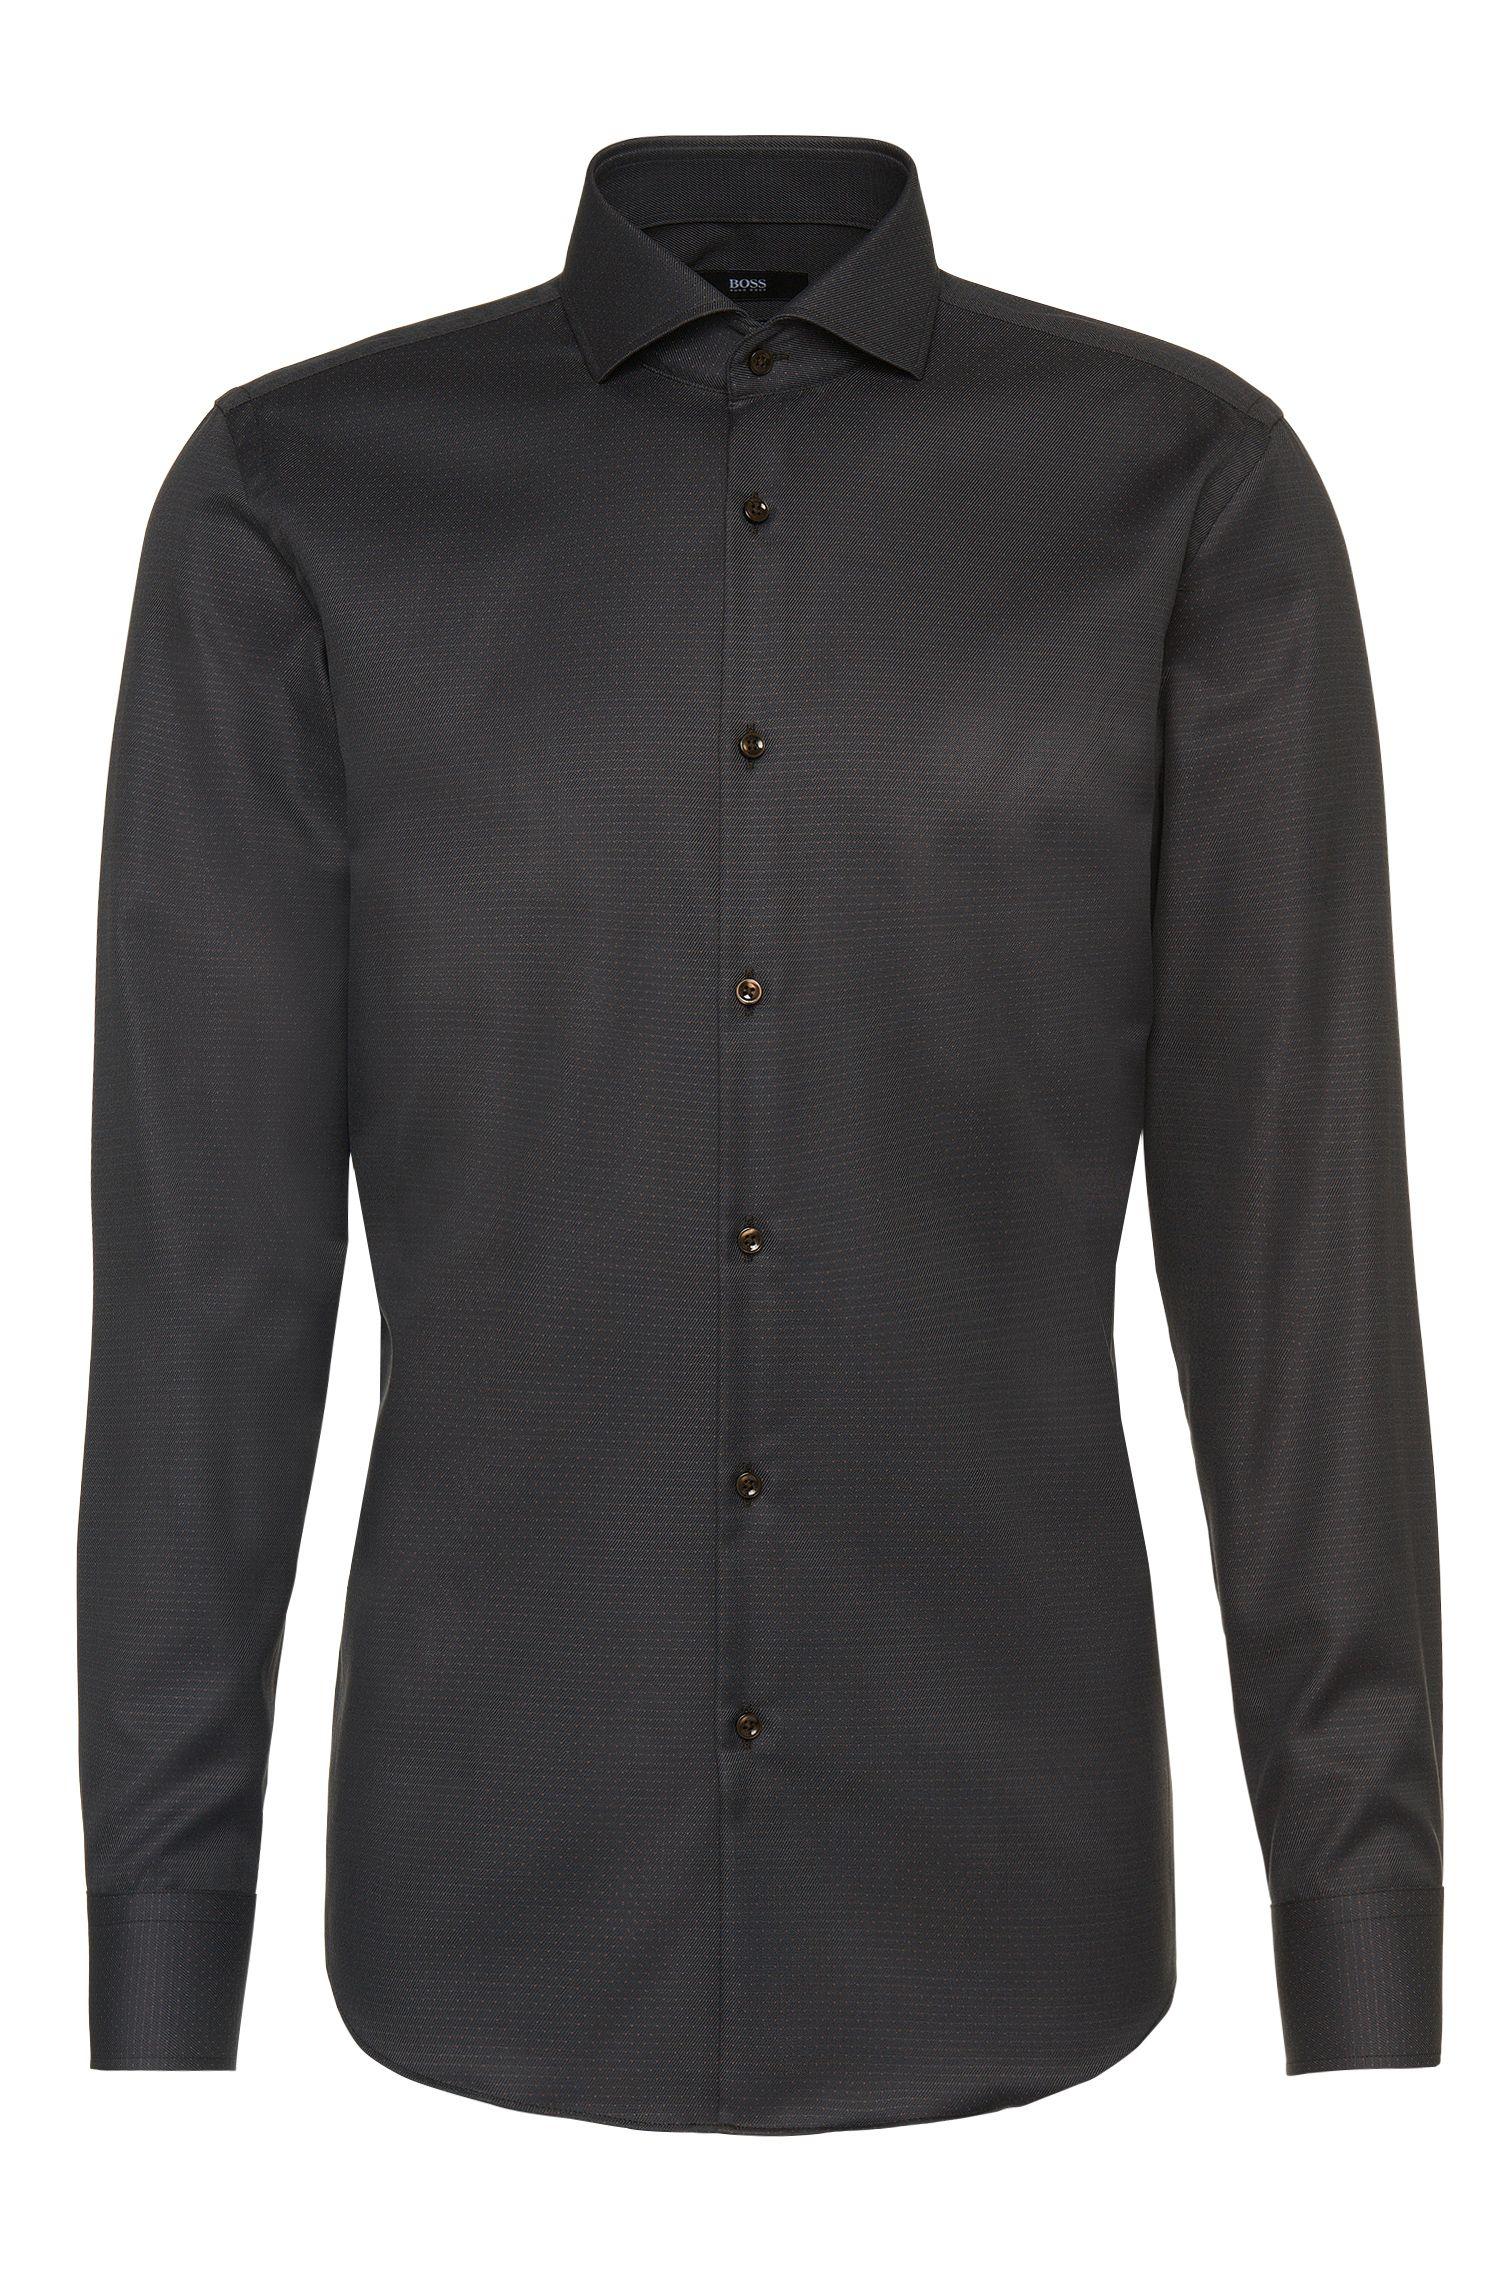 'Jason'   Slim Fit, Cotton Patterned Dress Shirt